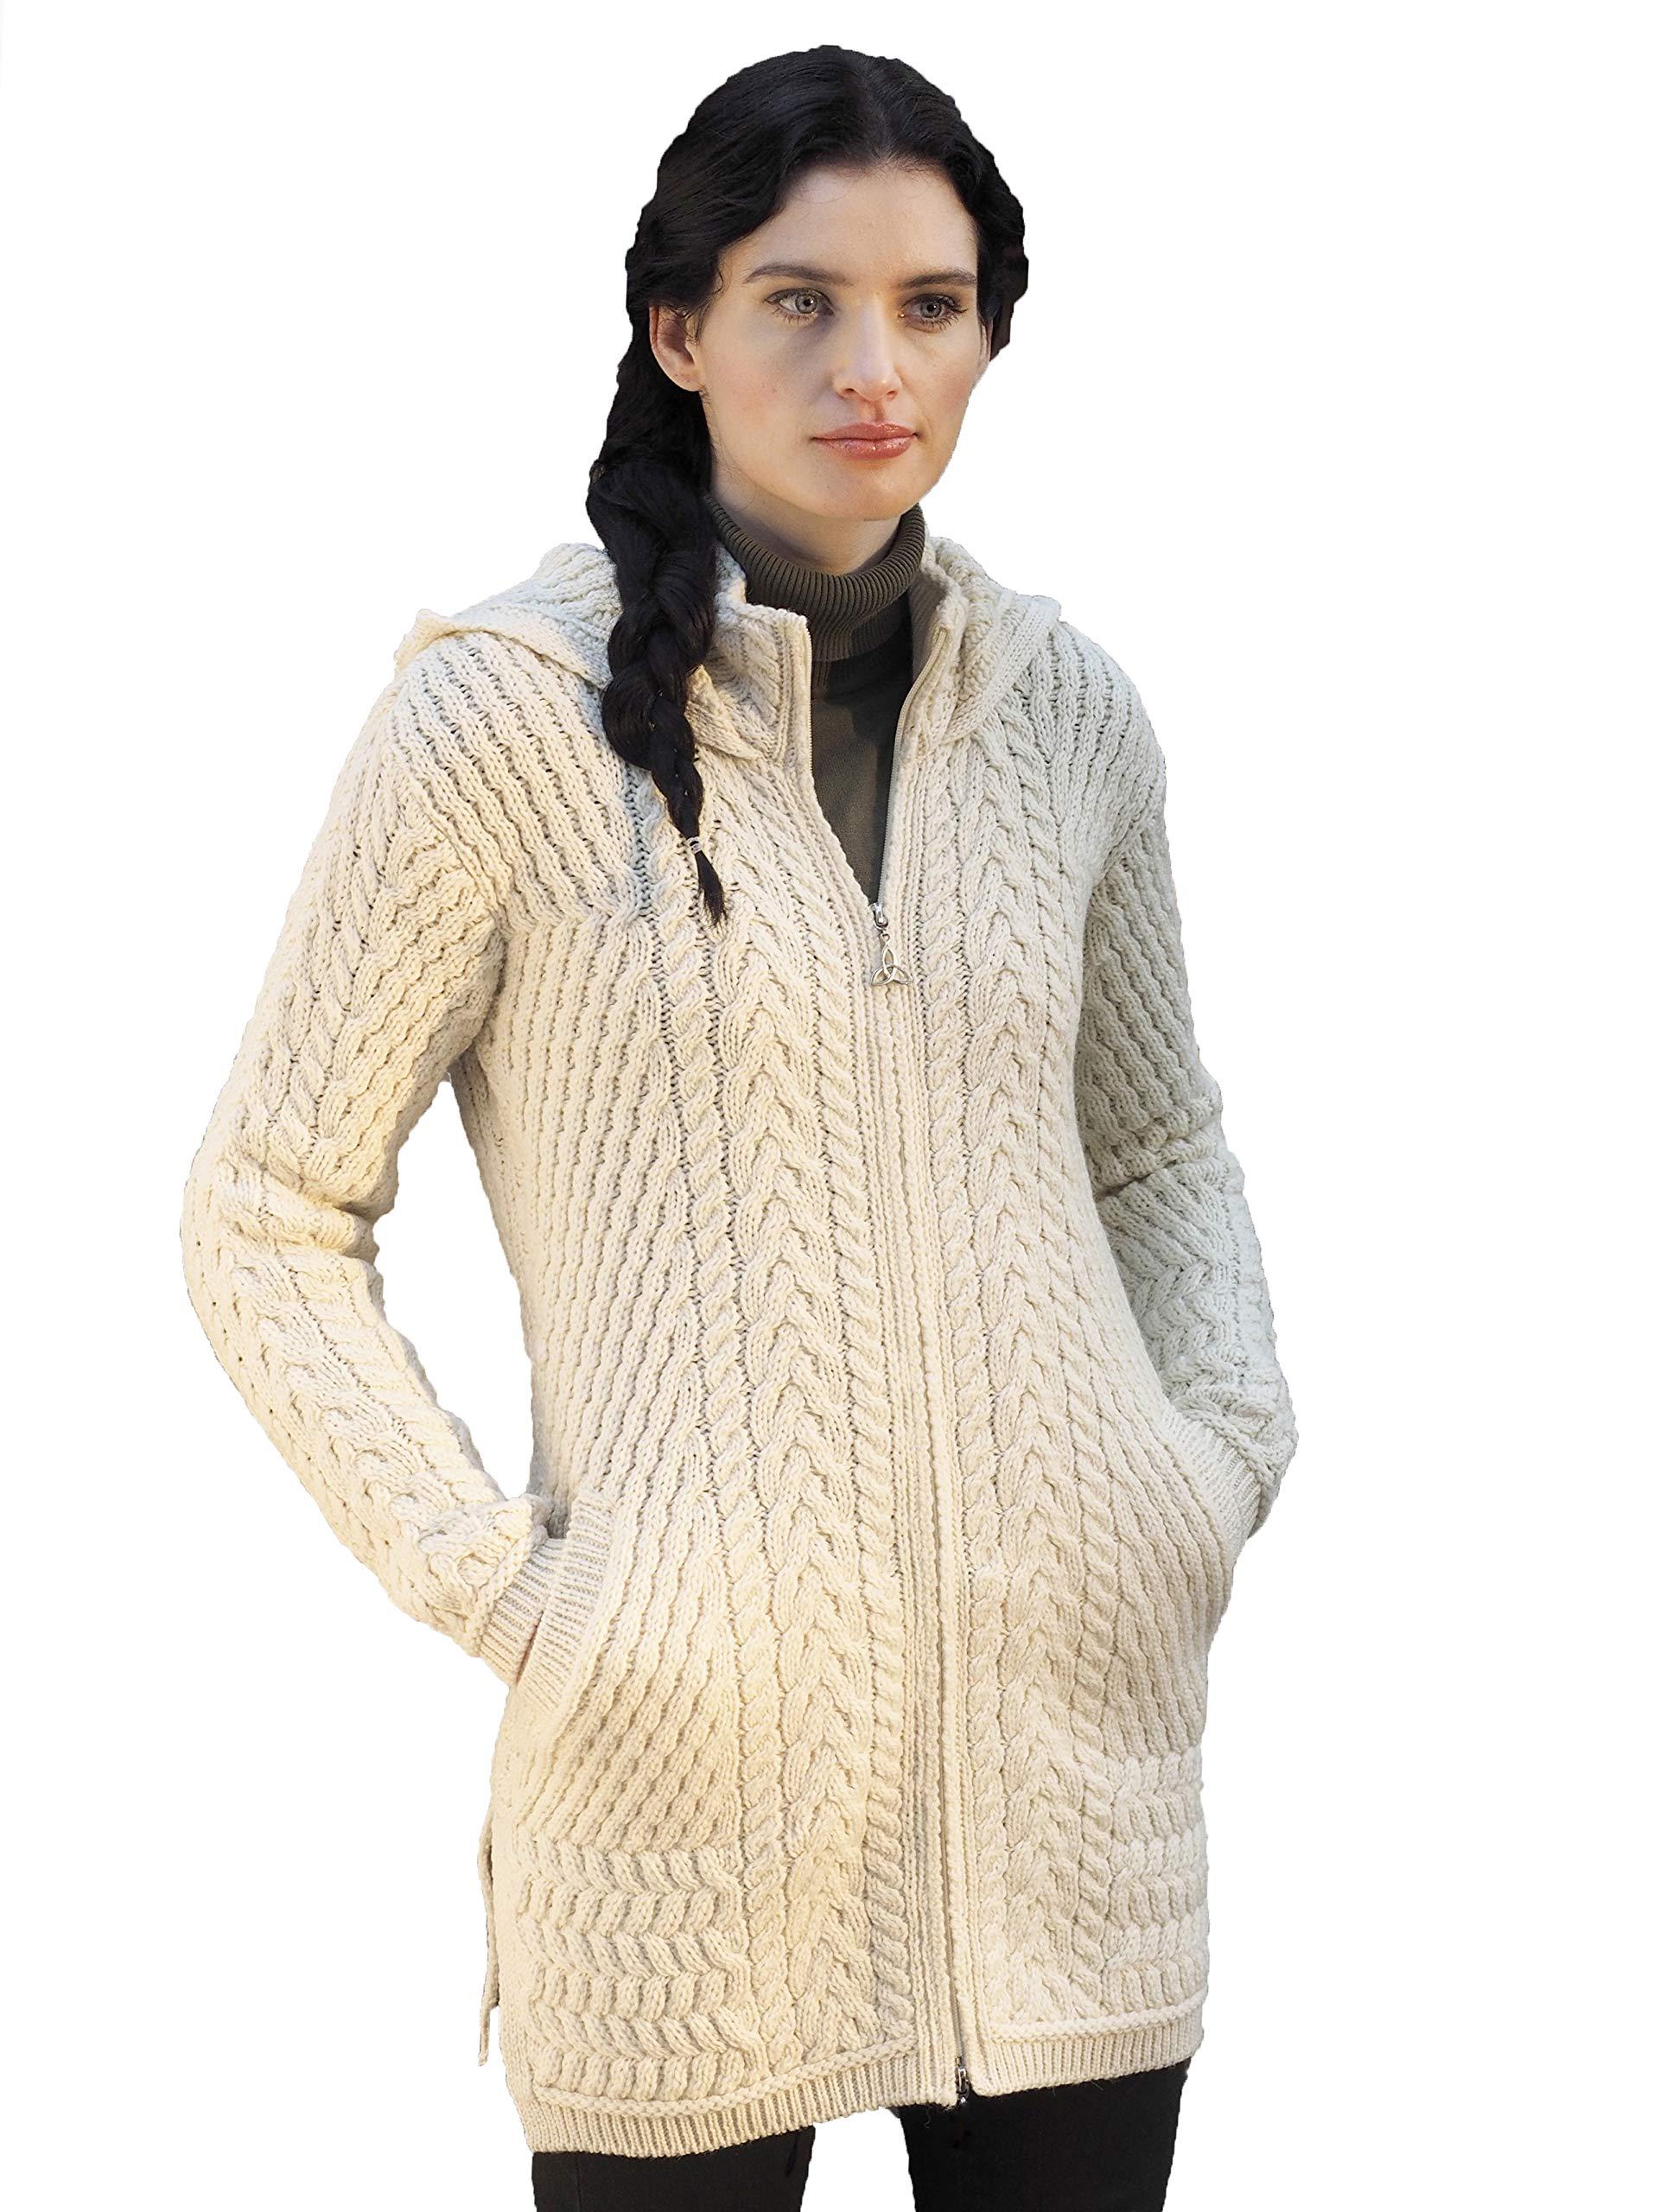 100% Merino Wool Aran Knit Ribbed Coat with Hood, Natural Colour